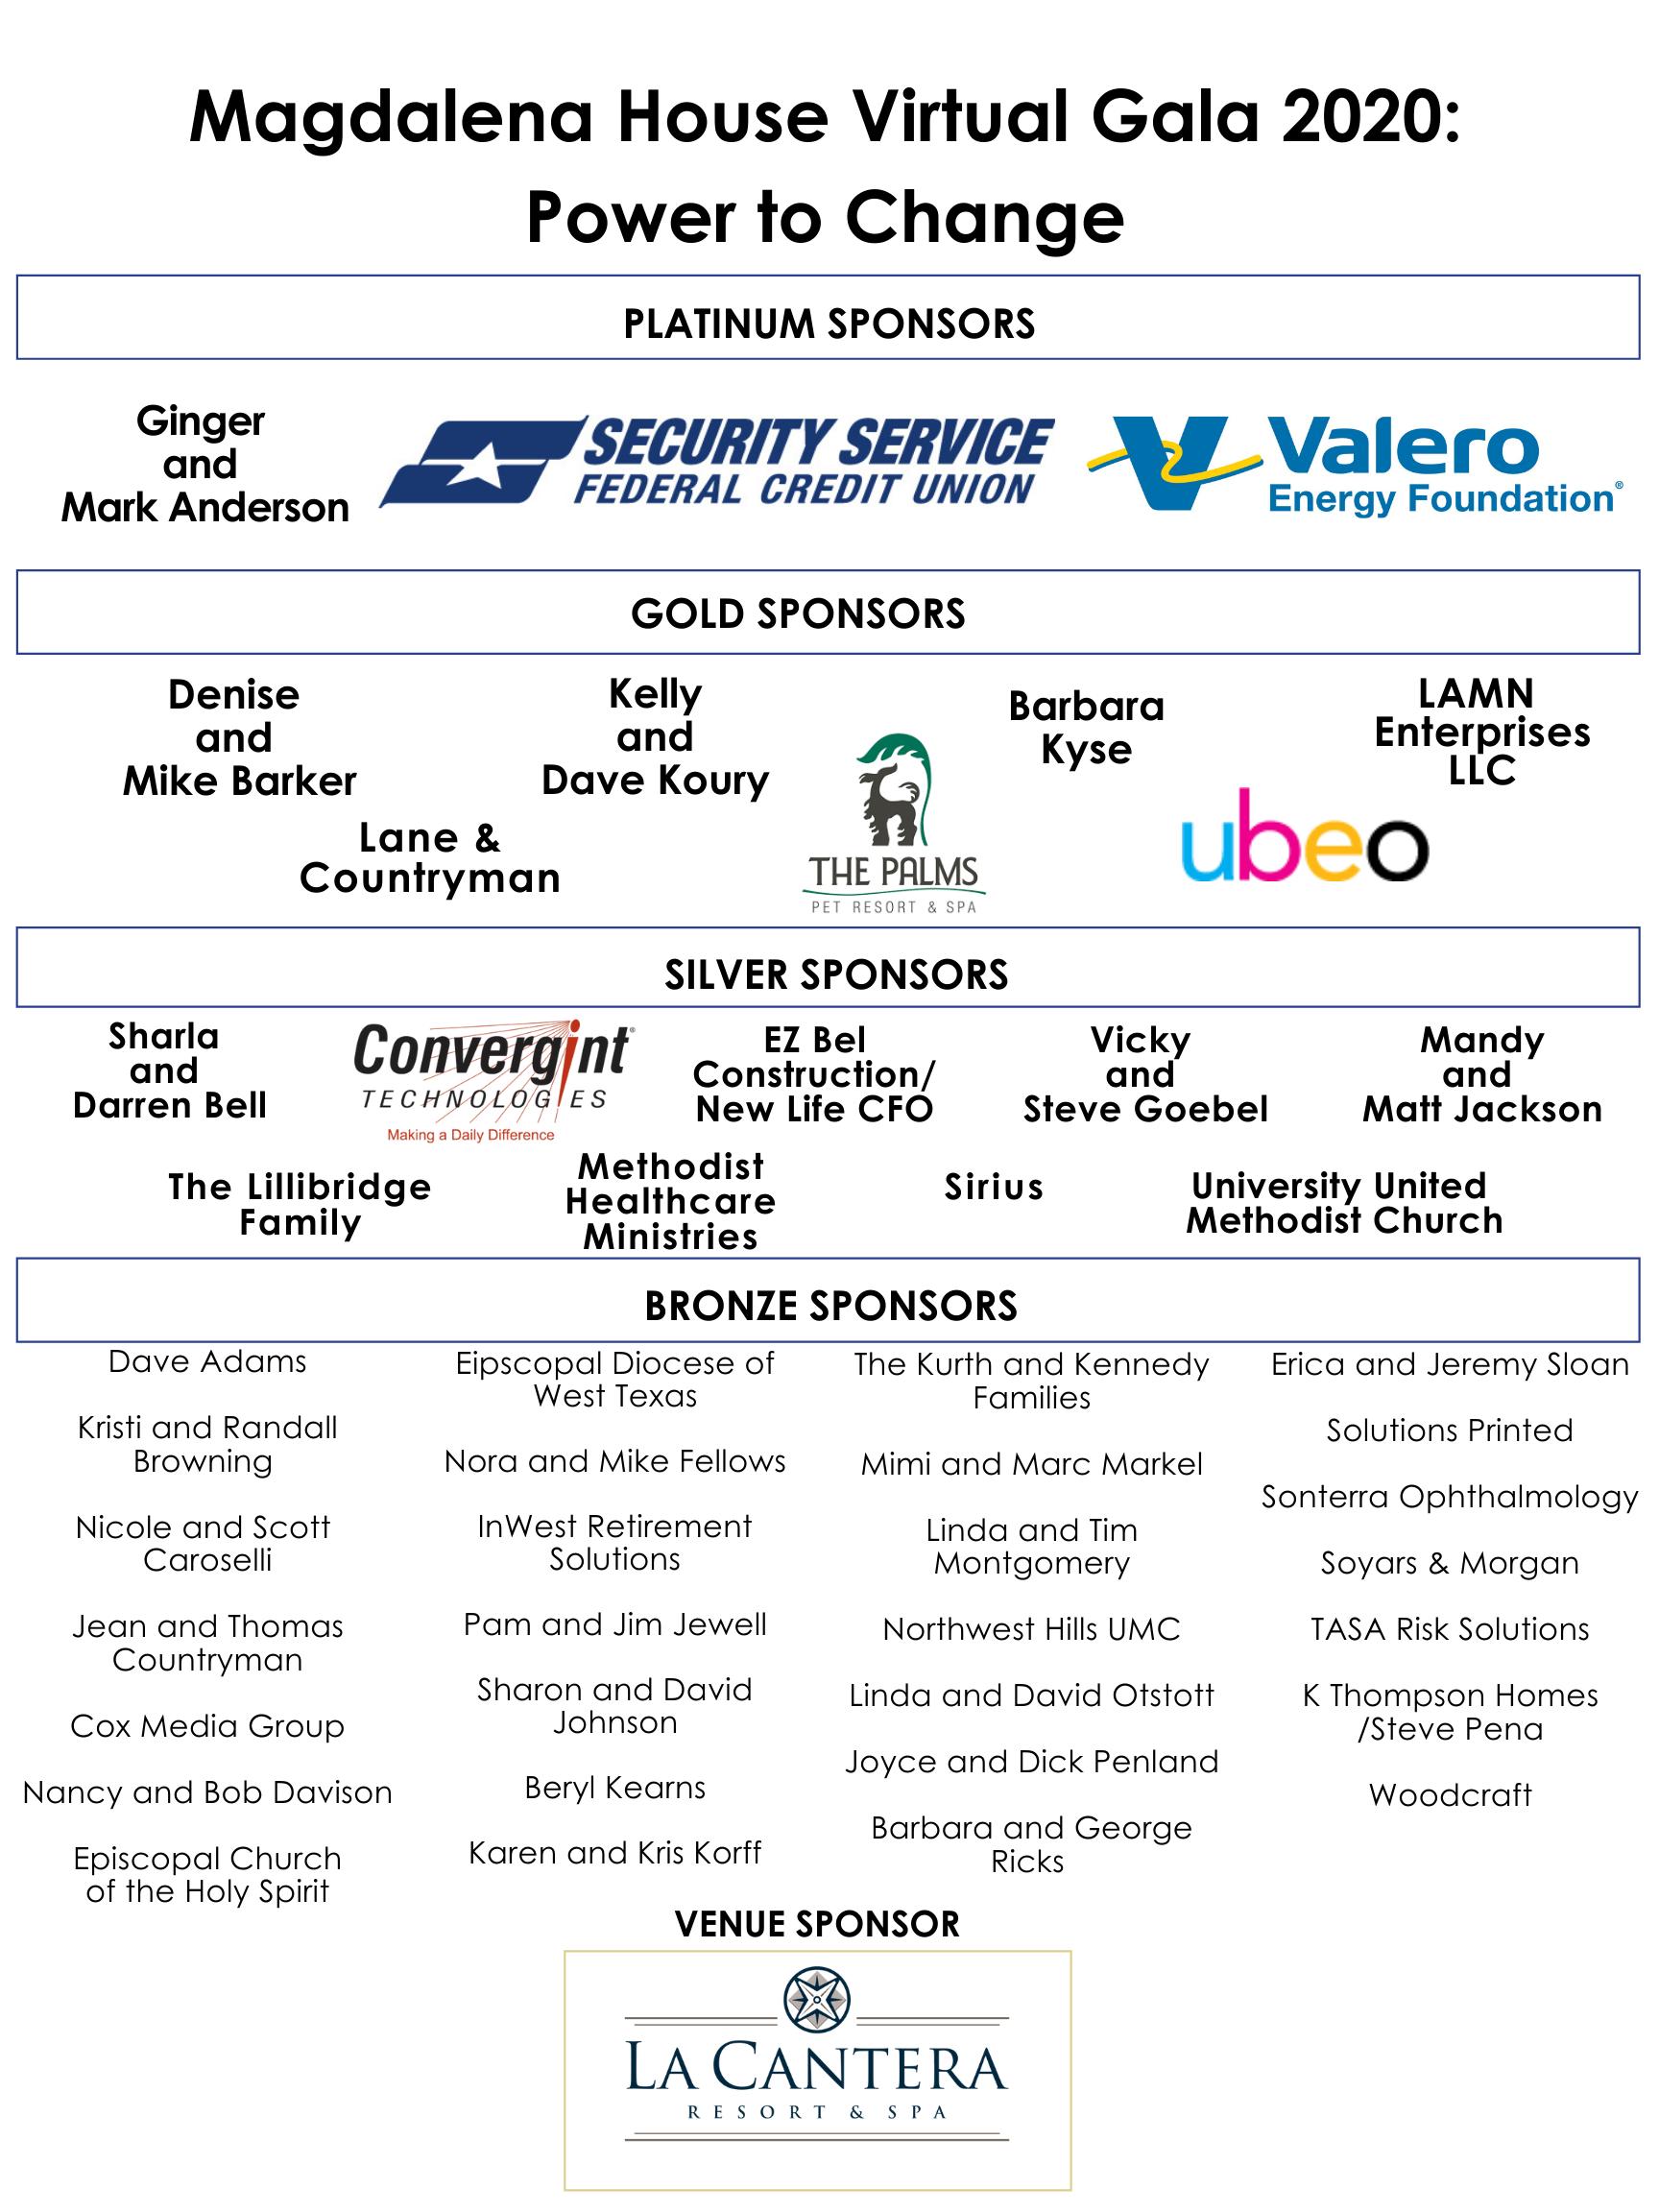 MH 2020 Gala Sponsors - 9-15-20